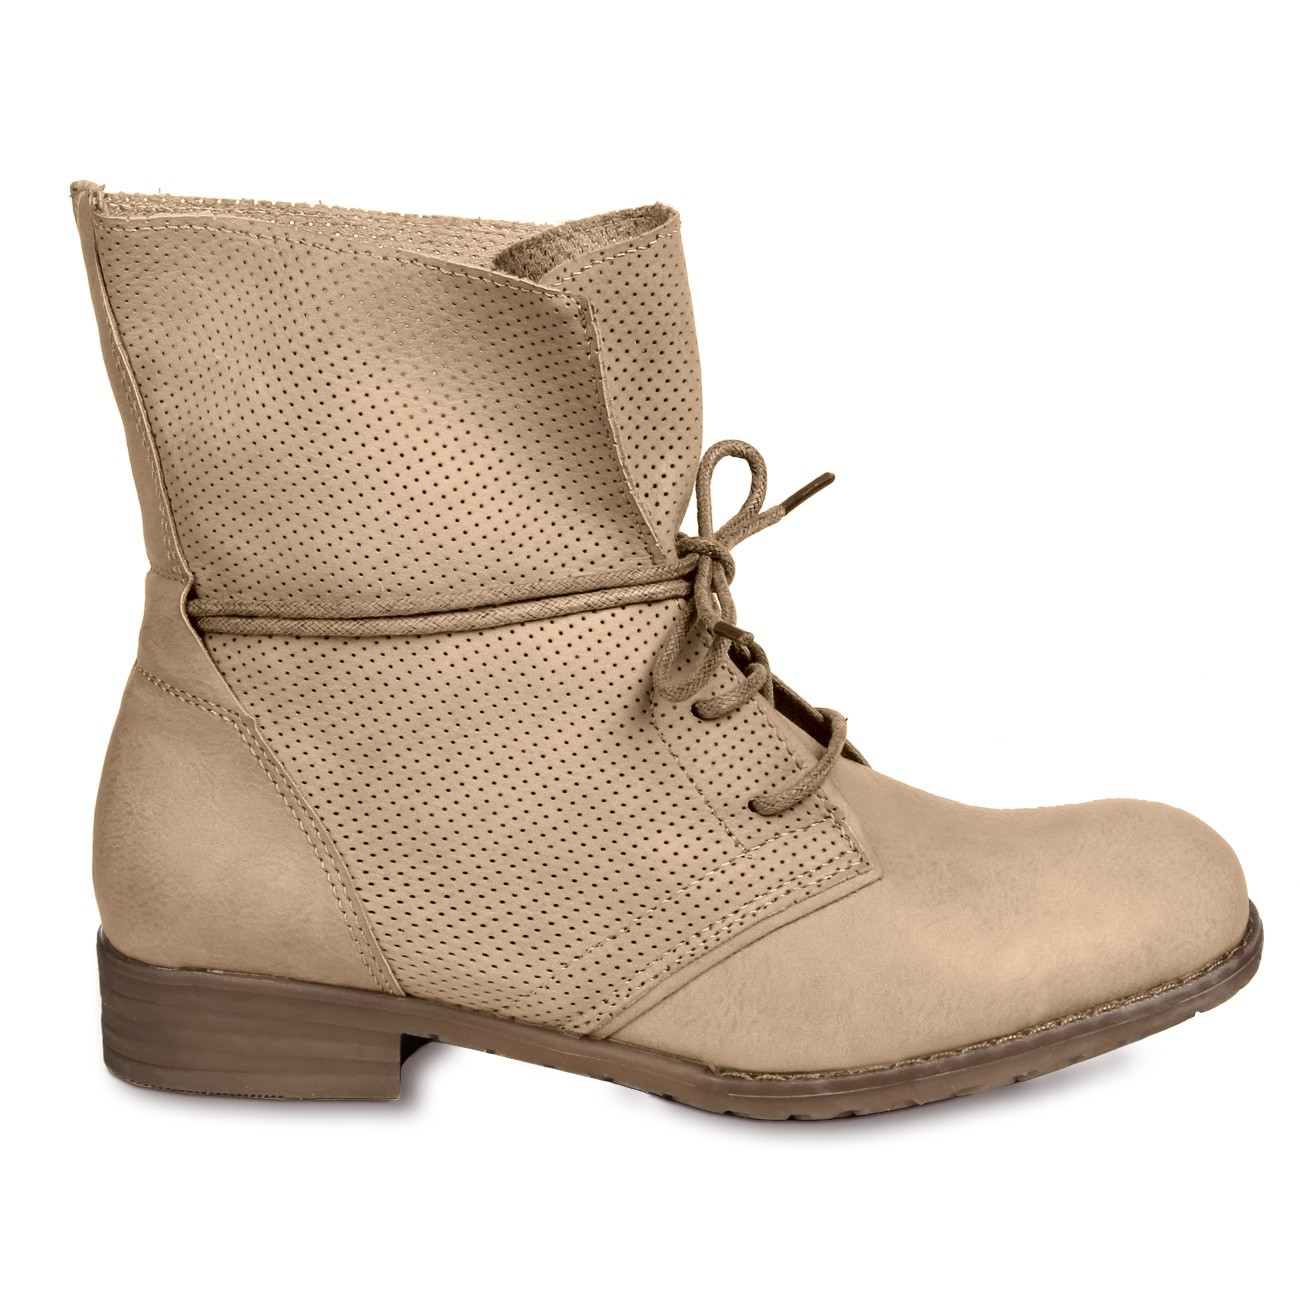 caspar damen vintage schn r stiefeletten boots stiefel. Black Bedroom Furniture Sets. Home Design Ideas